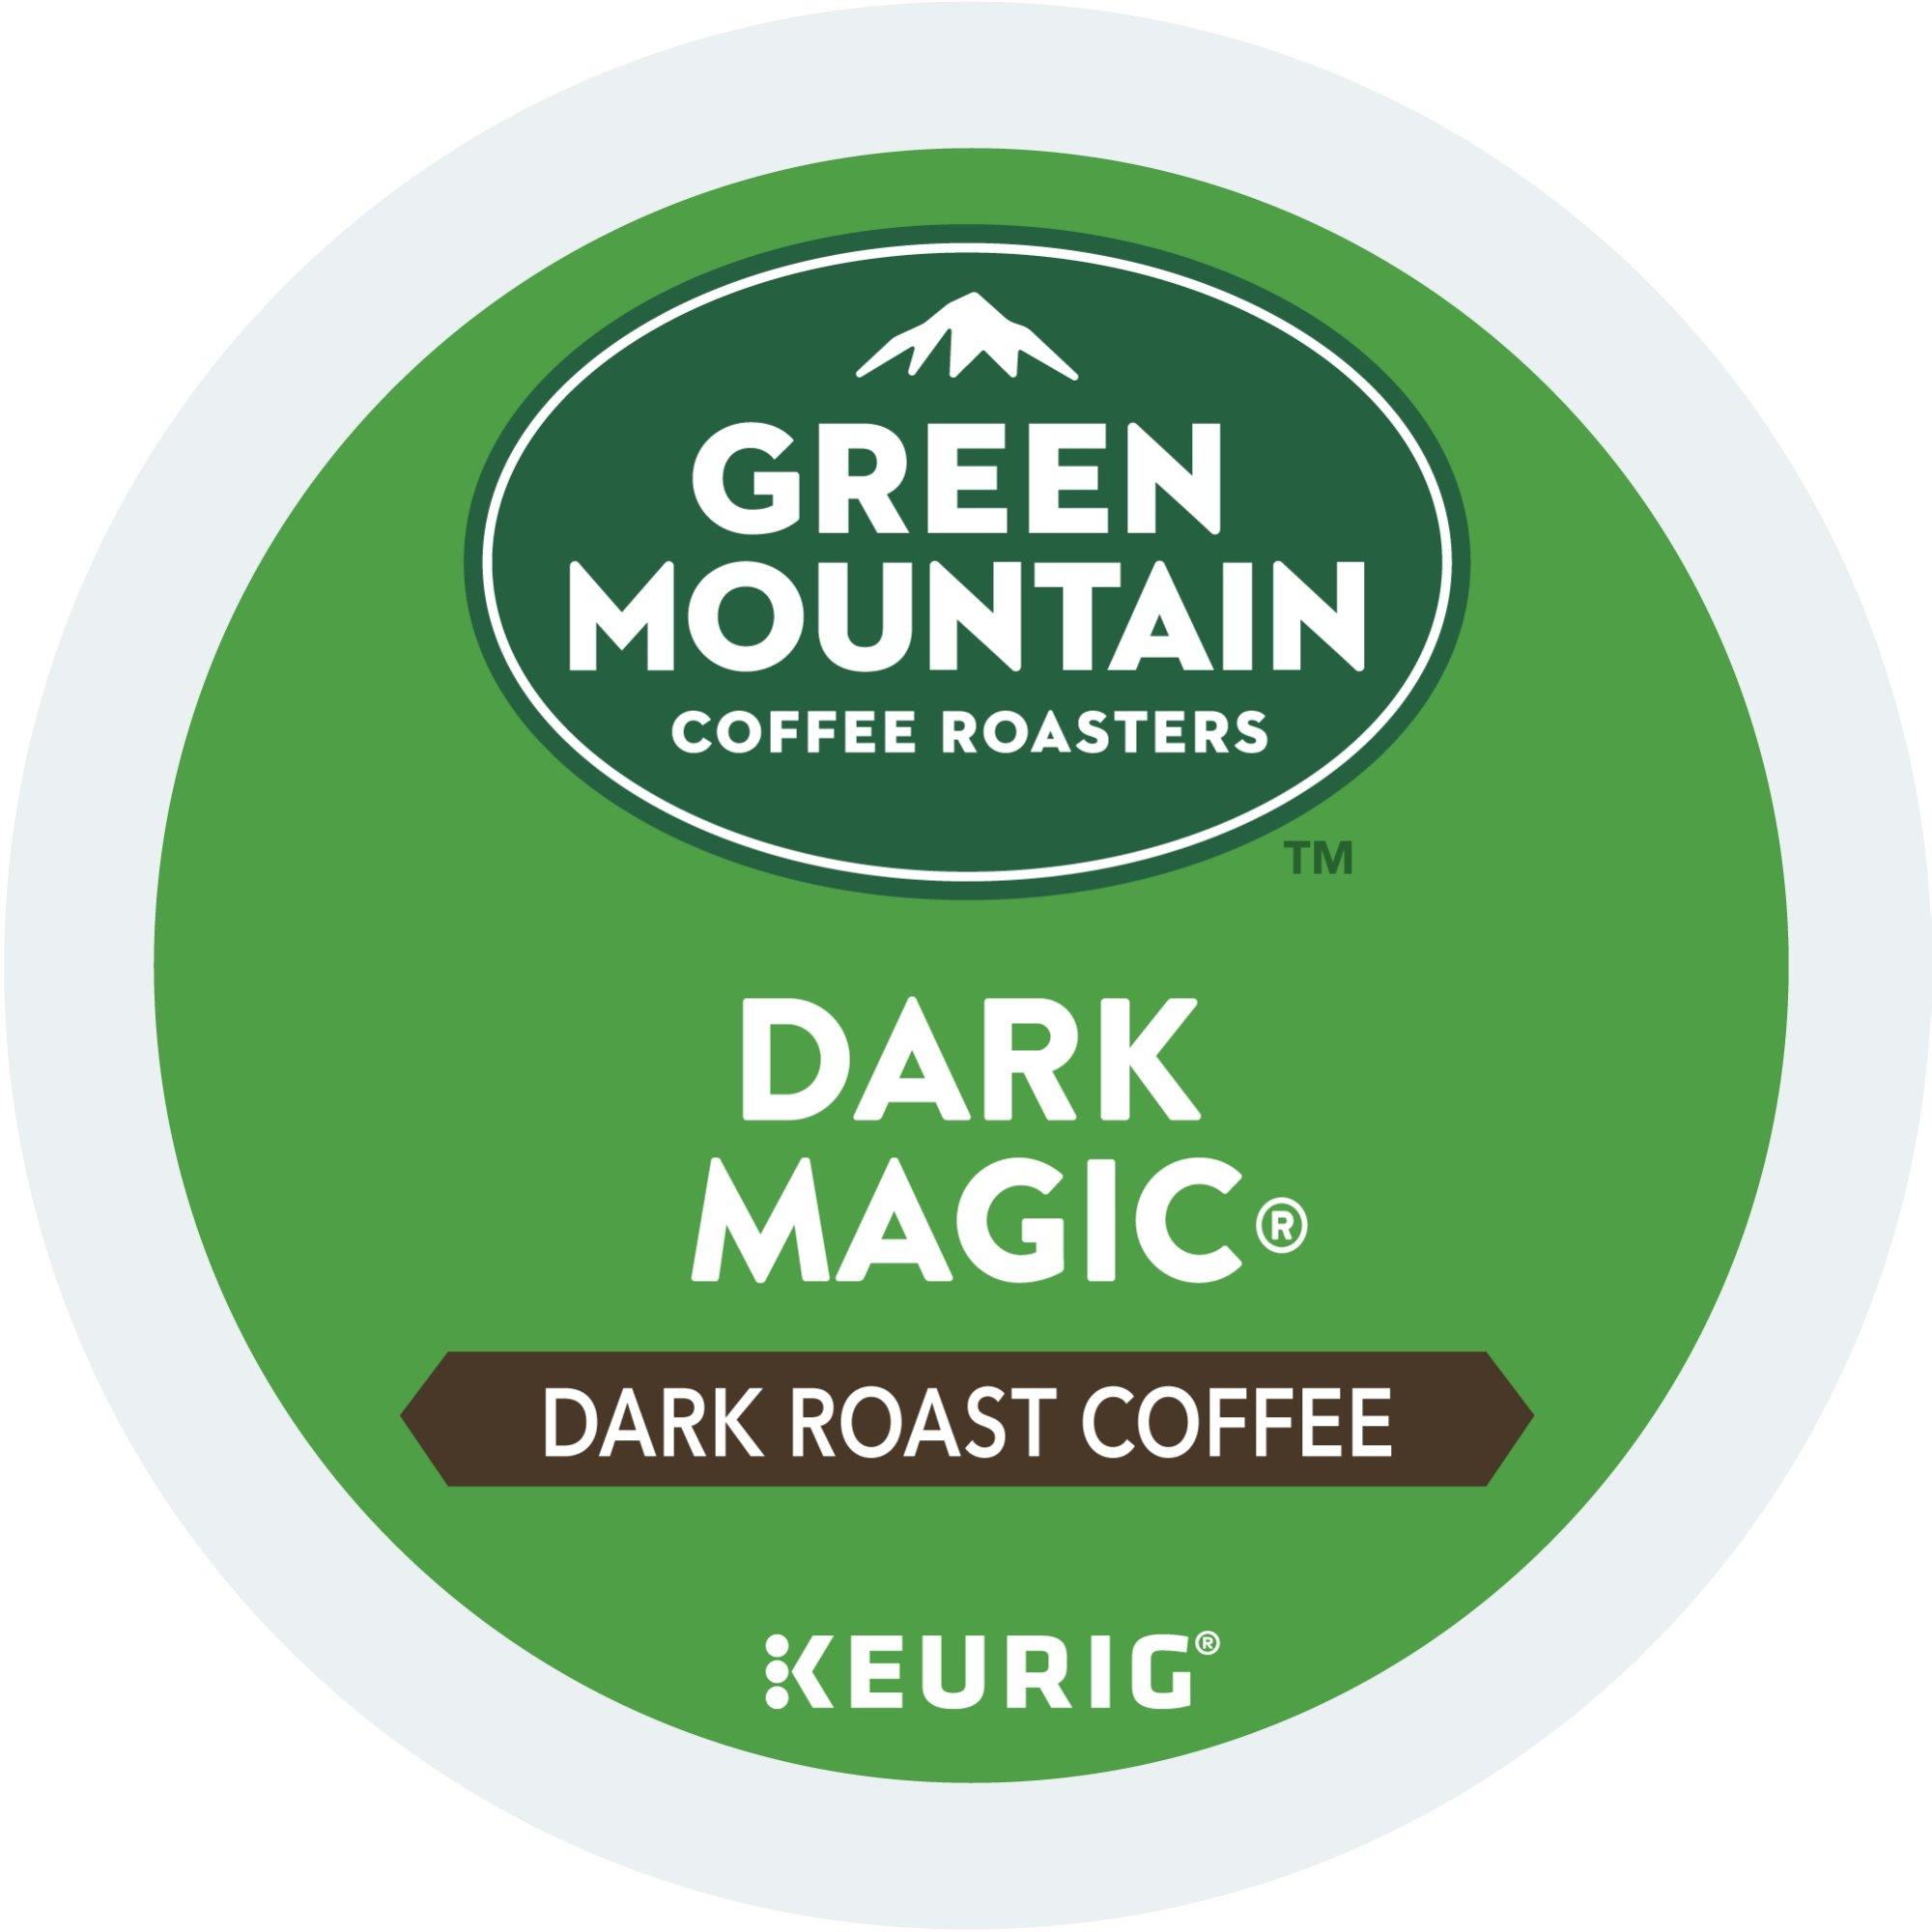 Green Mountain Coffee Roasters Dark Magic Keurig Single-Serve K-Cup Pods, Dark Roast Coffee, 72 Count